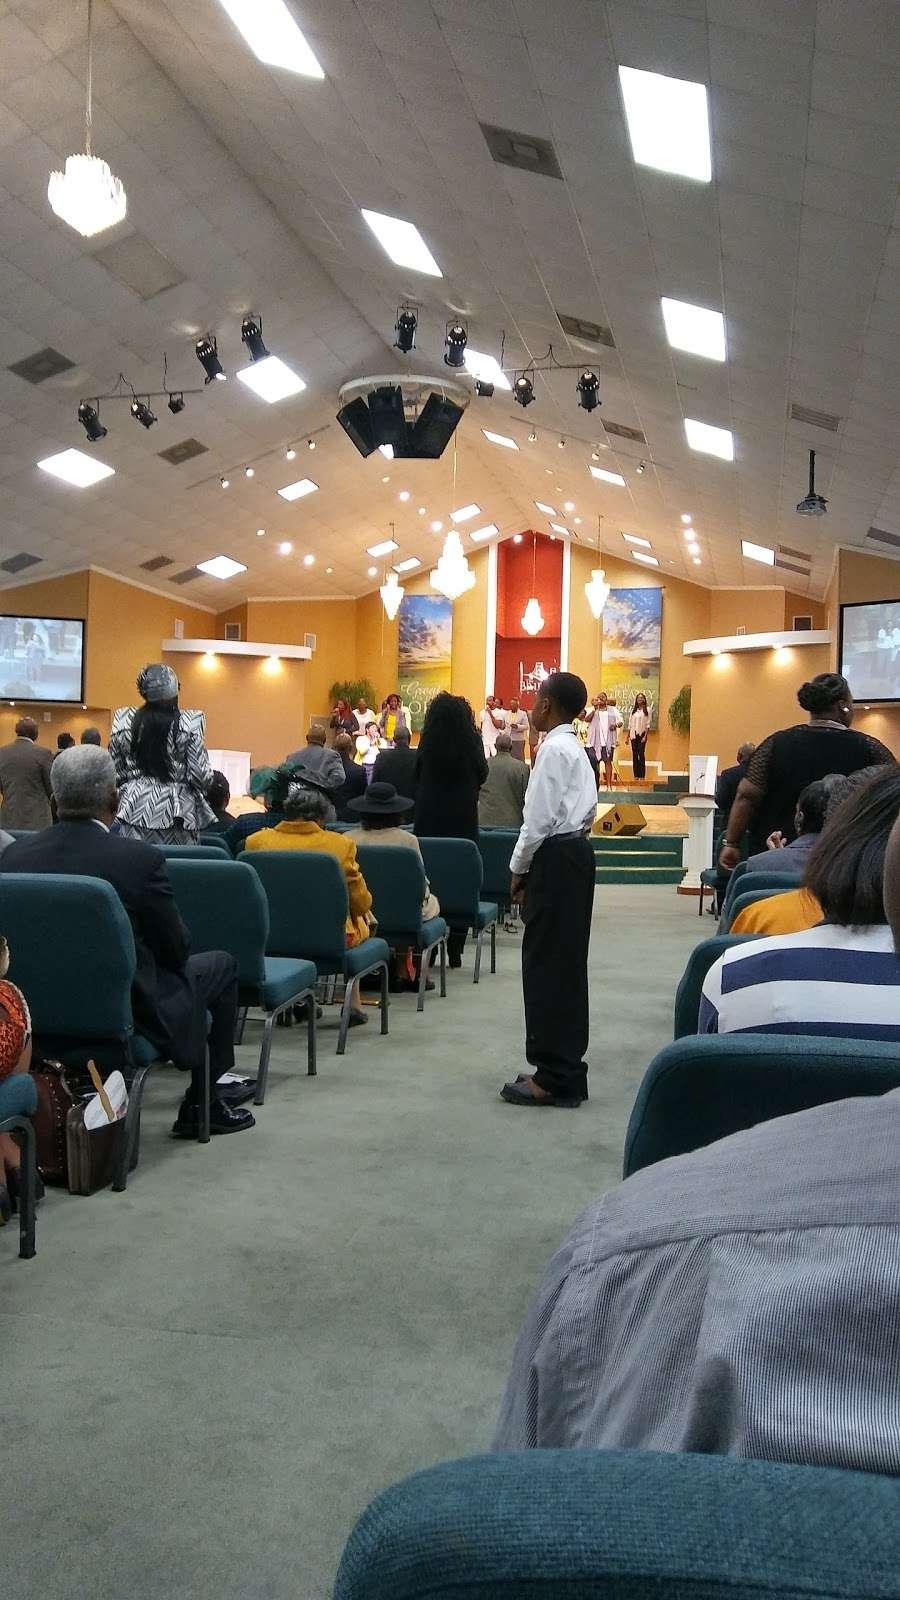 The Crossing Community Church - church  | Photo 1 of 10 | Address: 3225 W Orem Dr, Houston, TX 77045, USA | Phone: (713) 433-2862